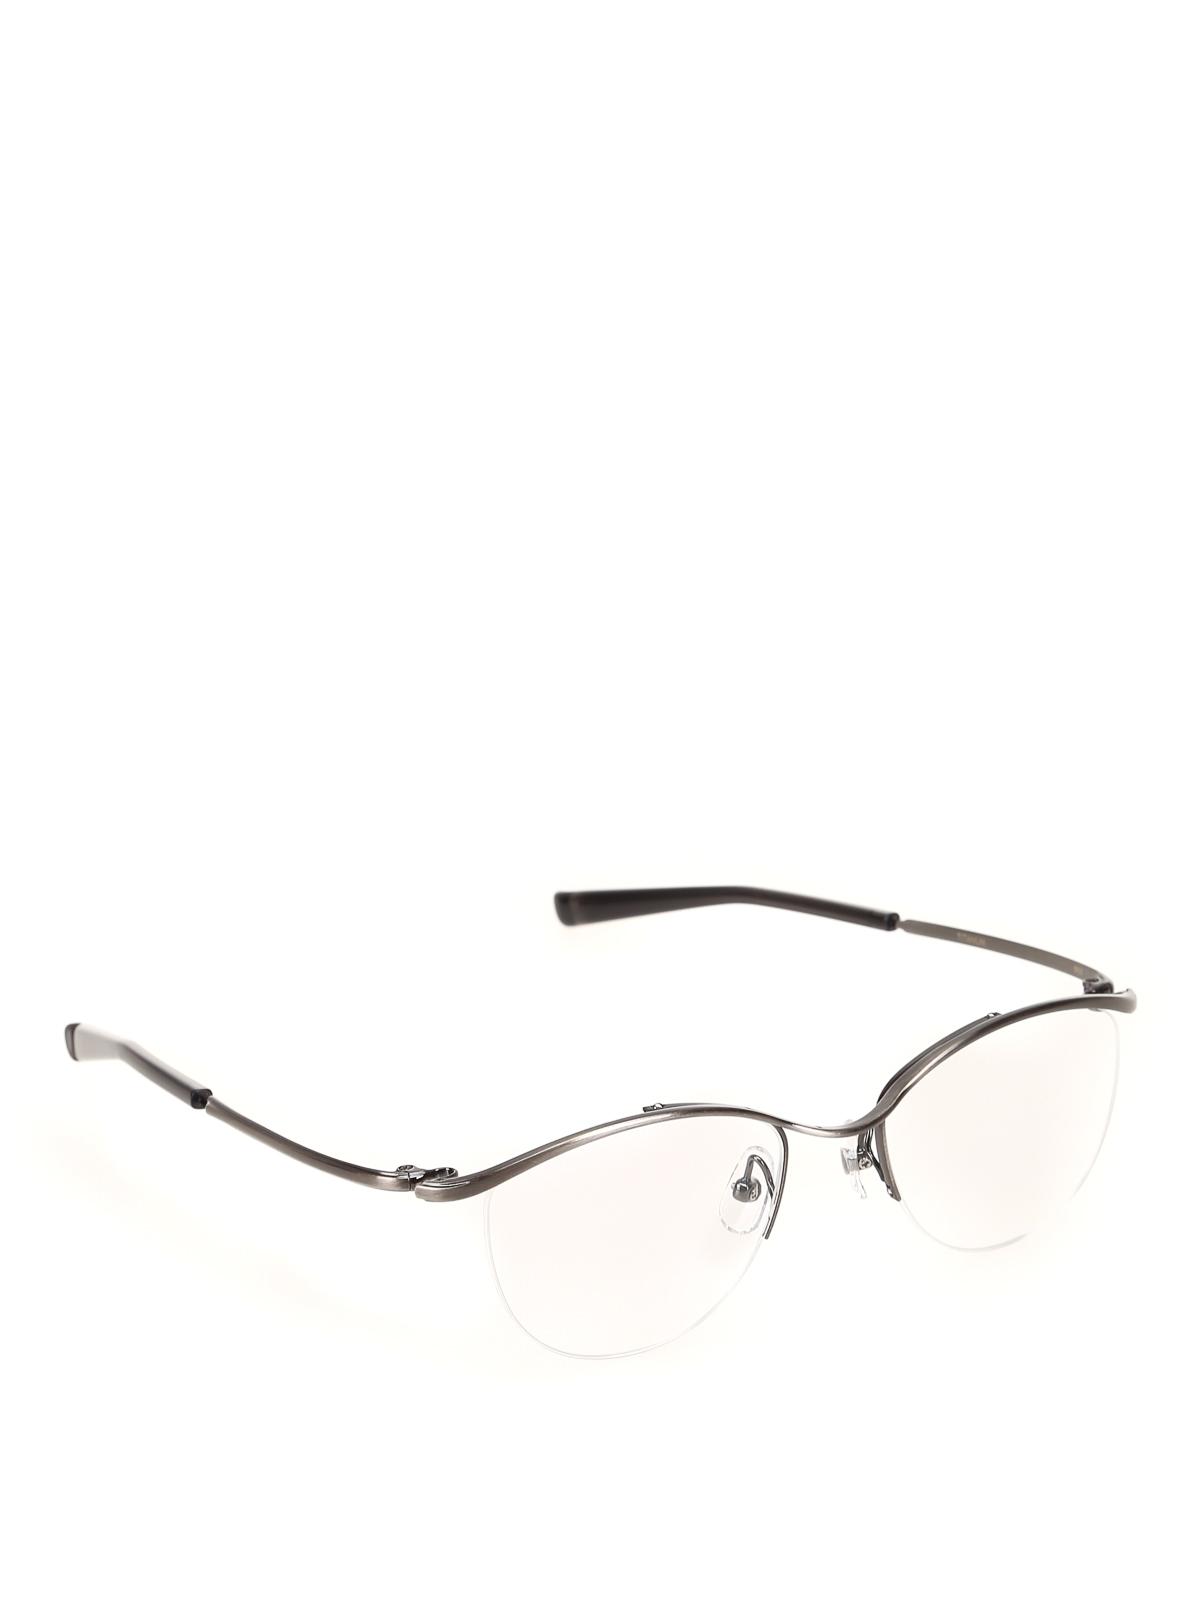 b371ba9f91 999.9 four nines - Titanium eyeglasses - glasses - S846T4